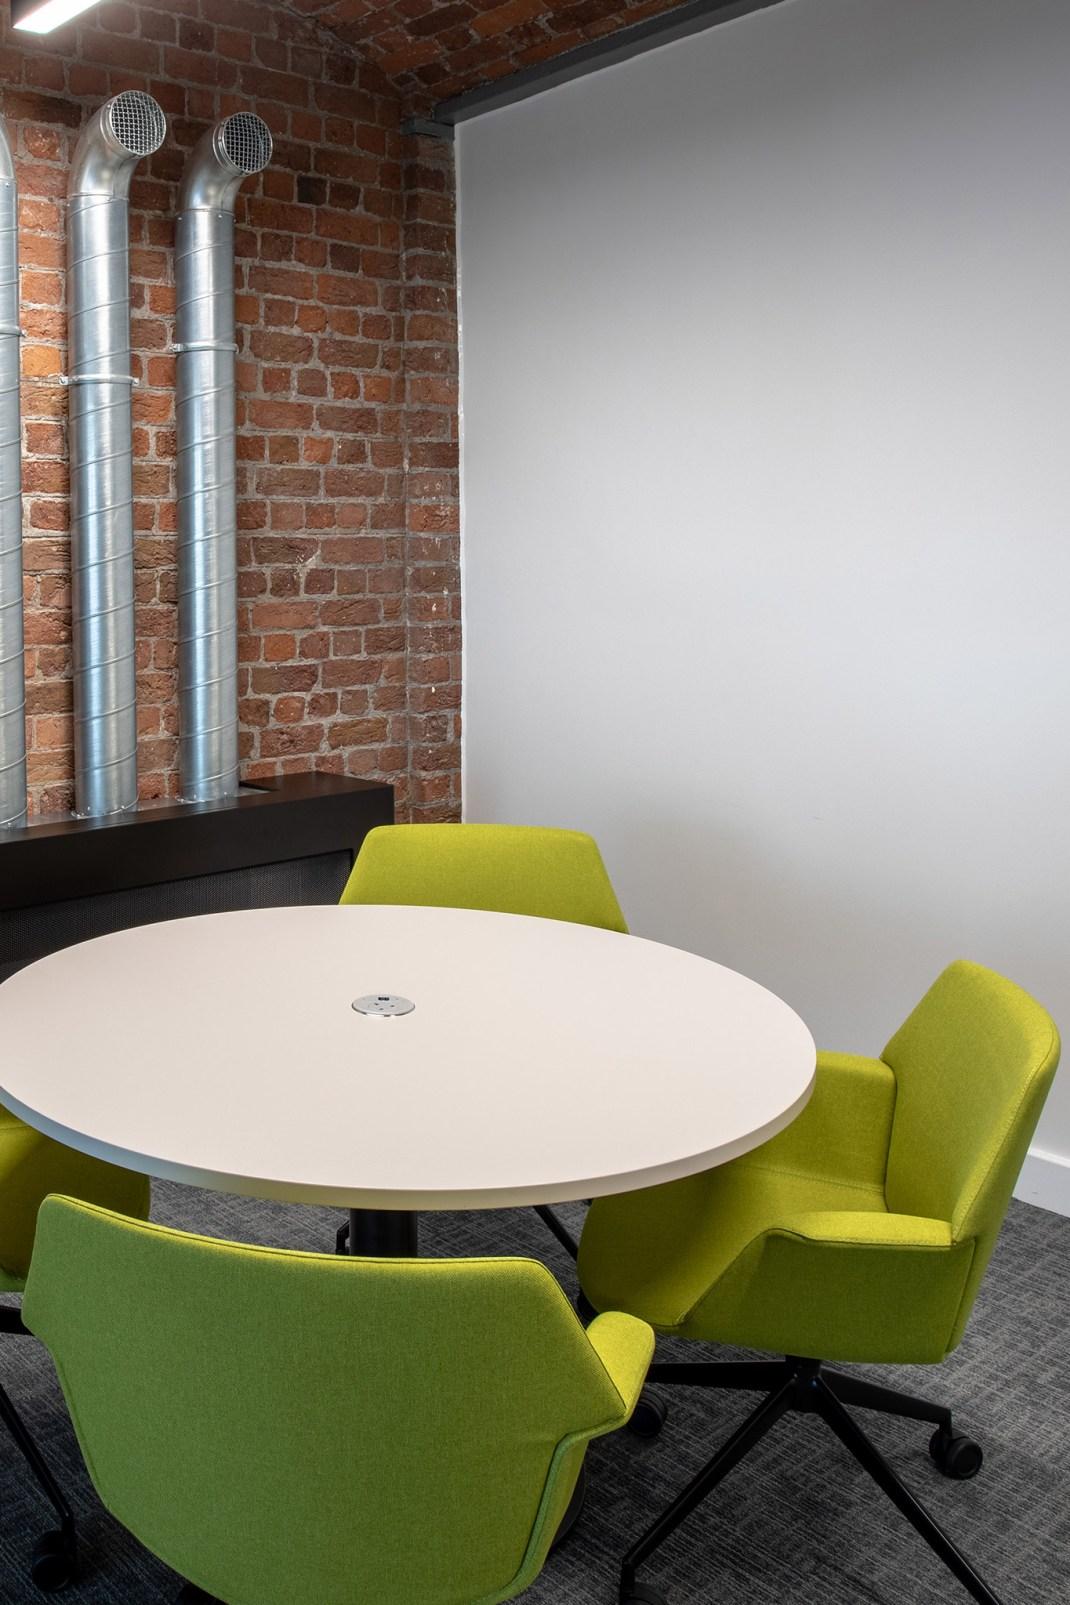 clemorton little meeting-room-in-liverpool-s1